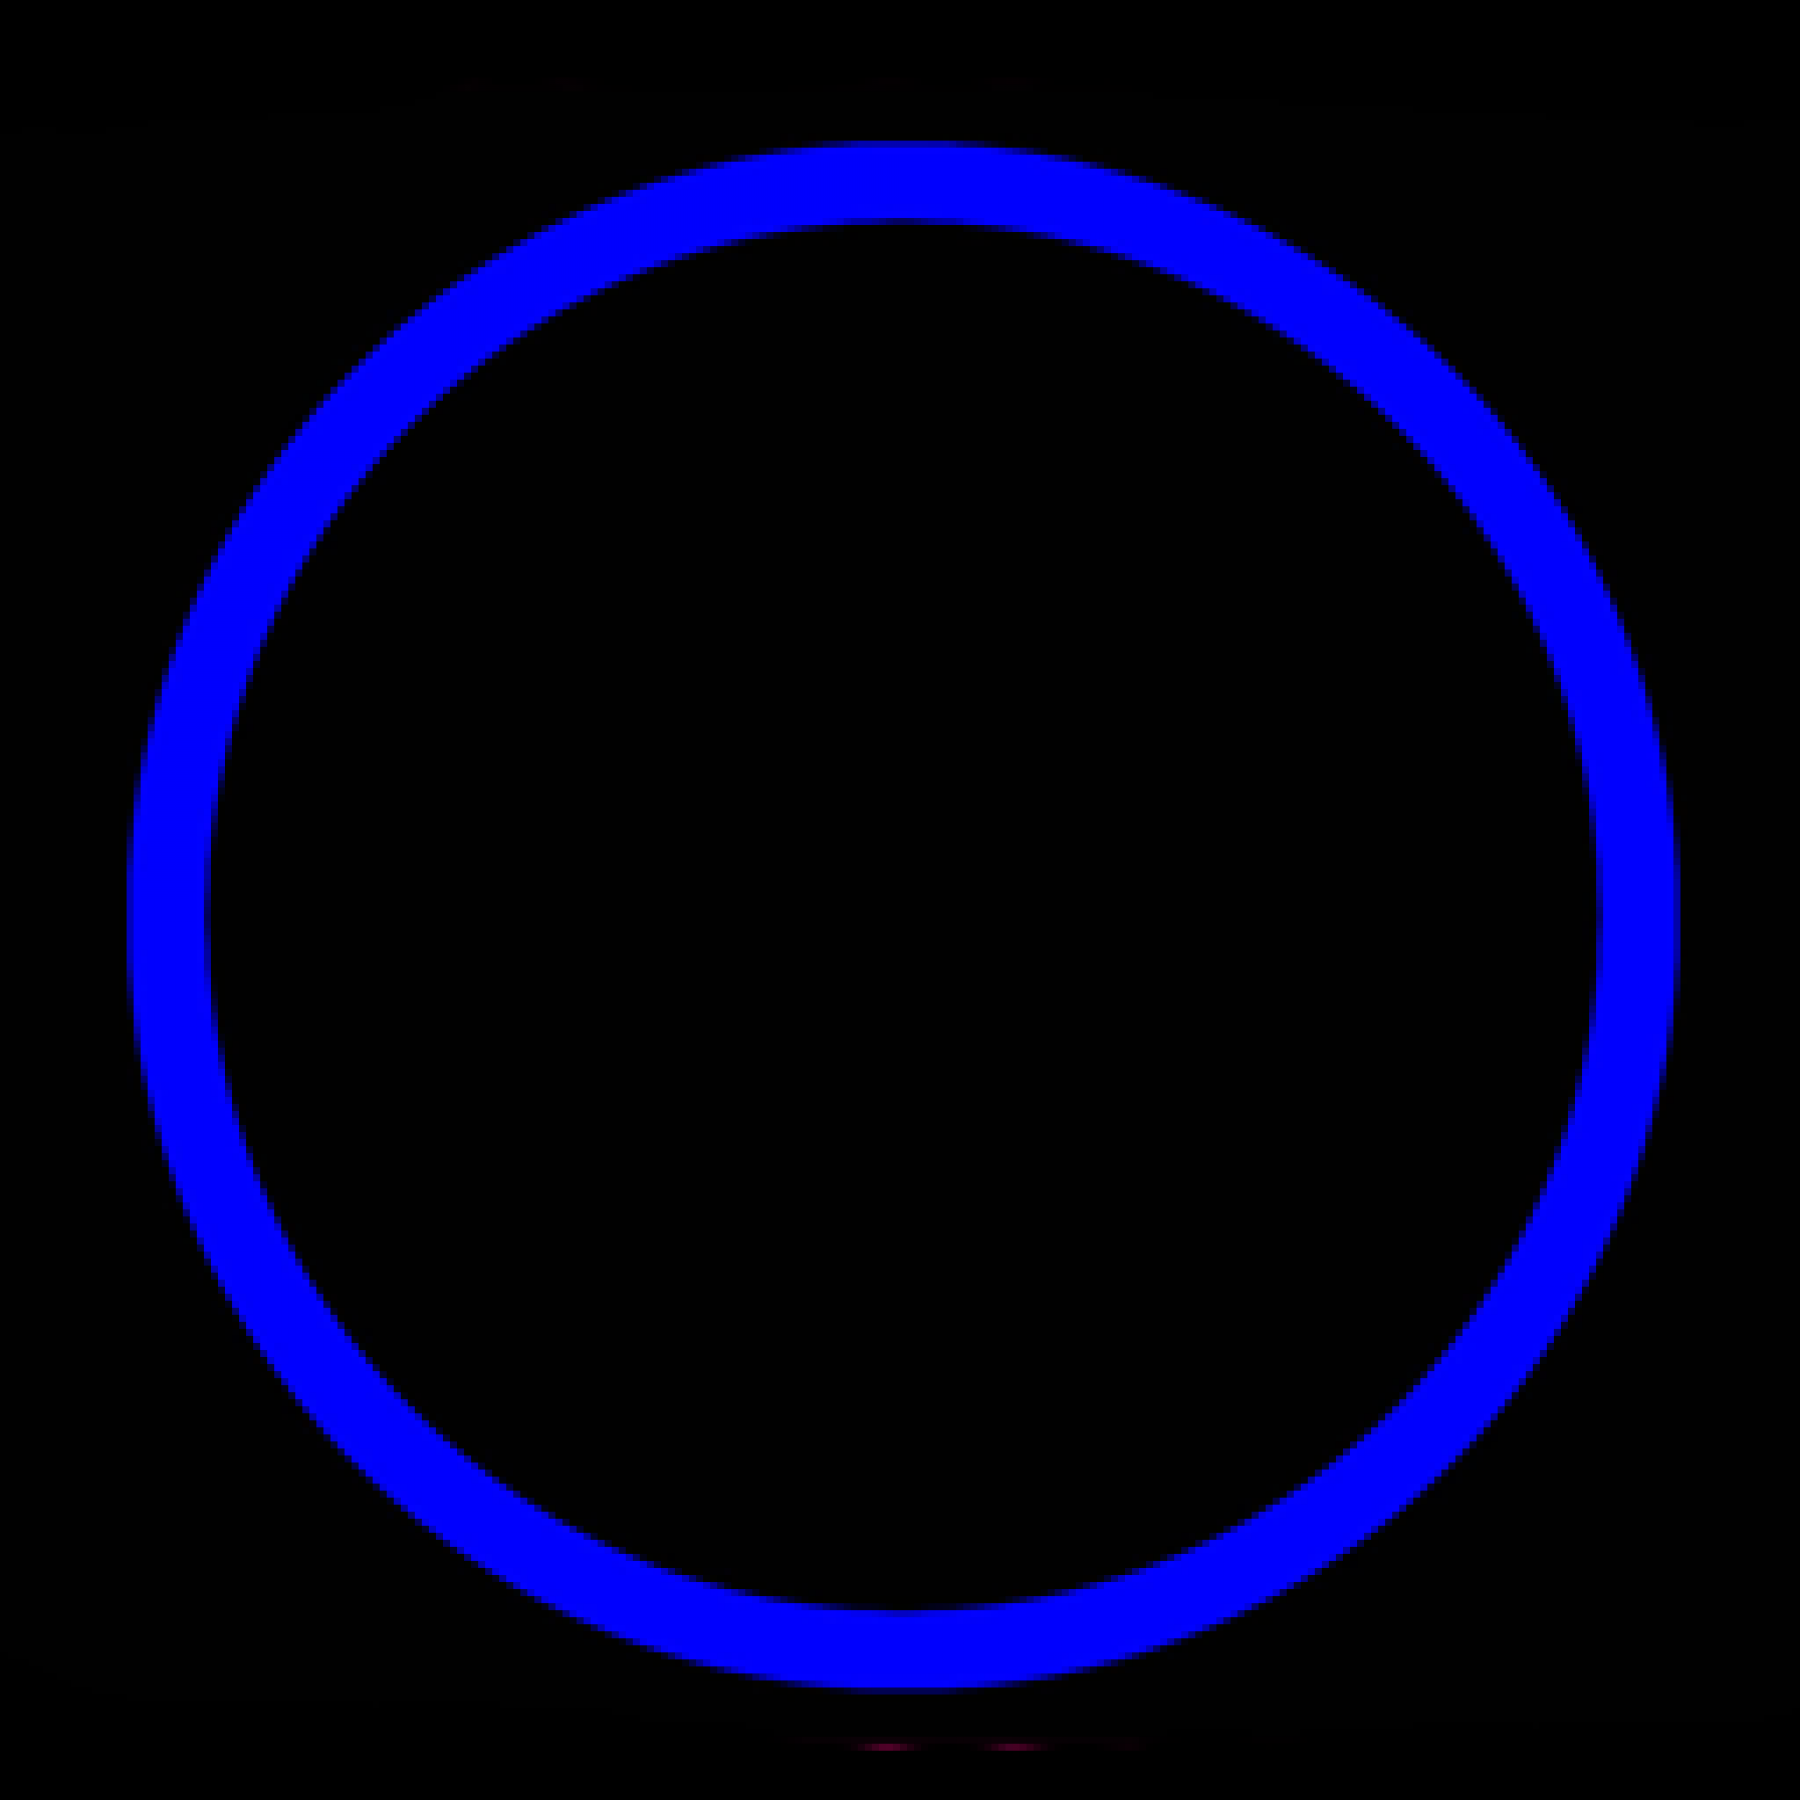 circle-kids-education-main-location1